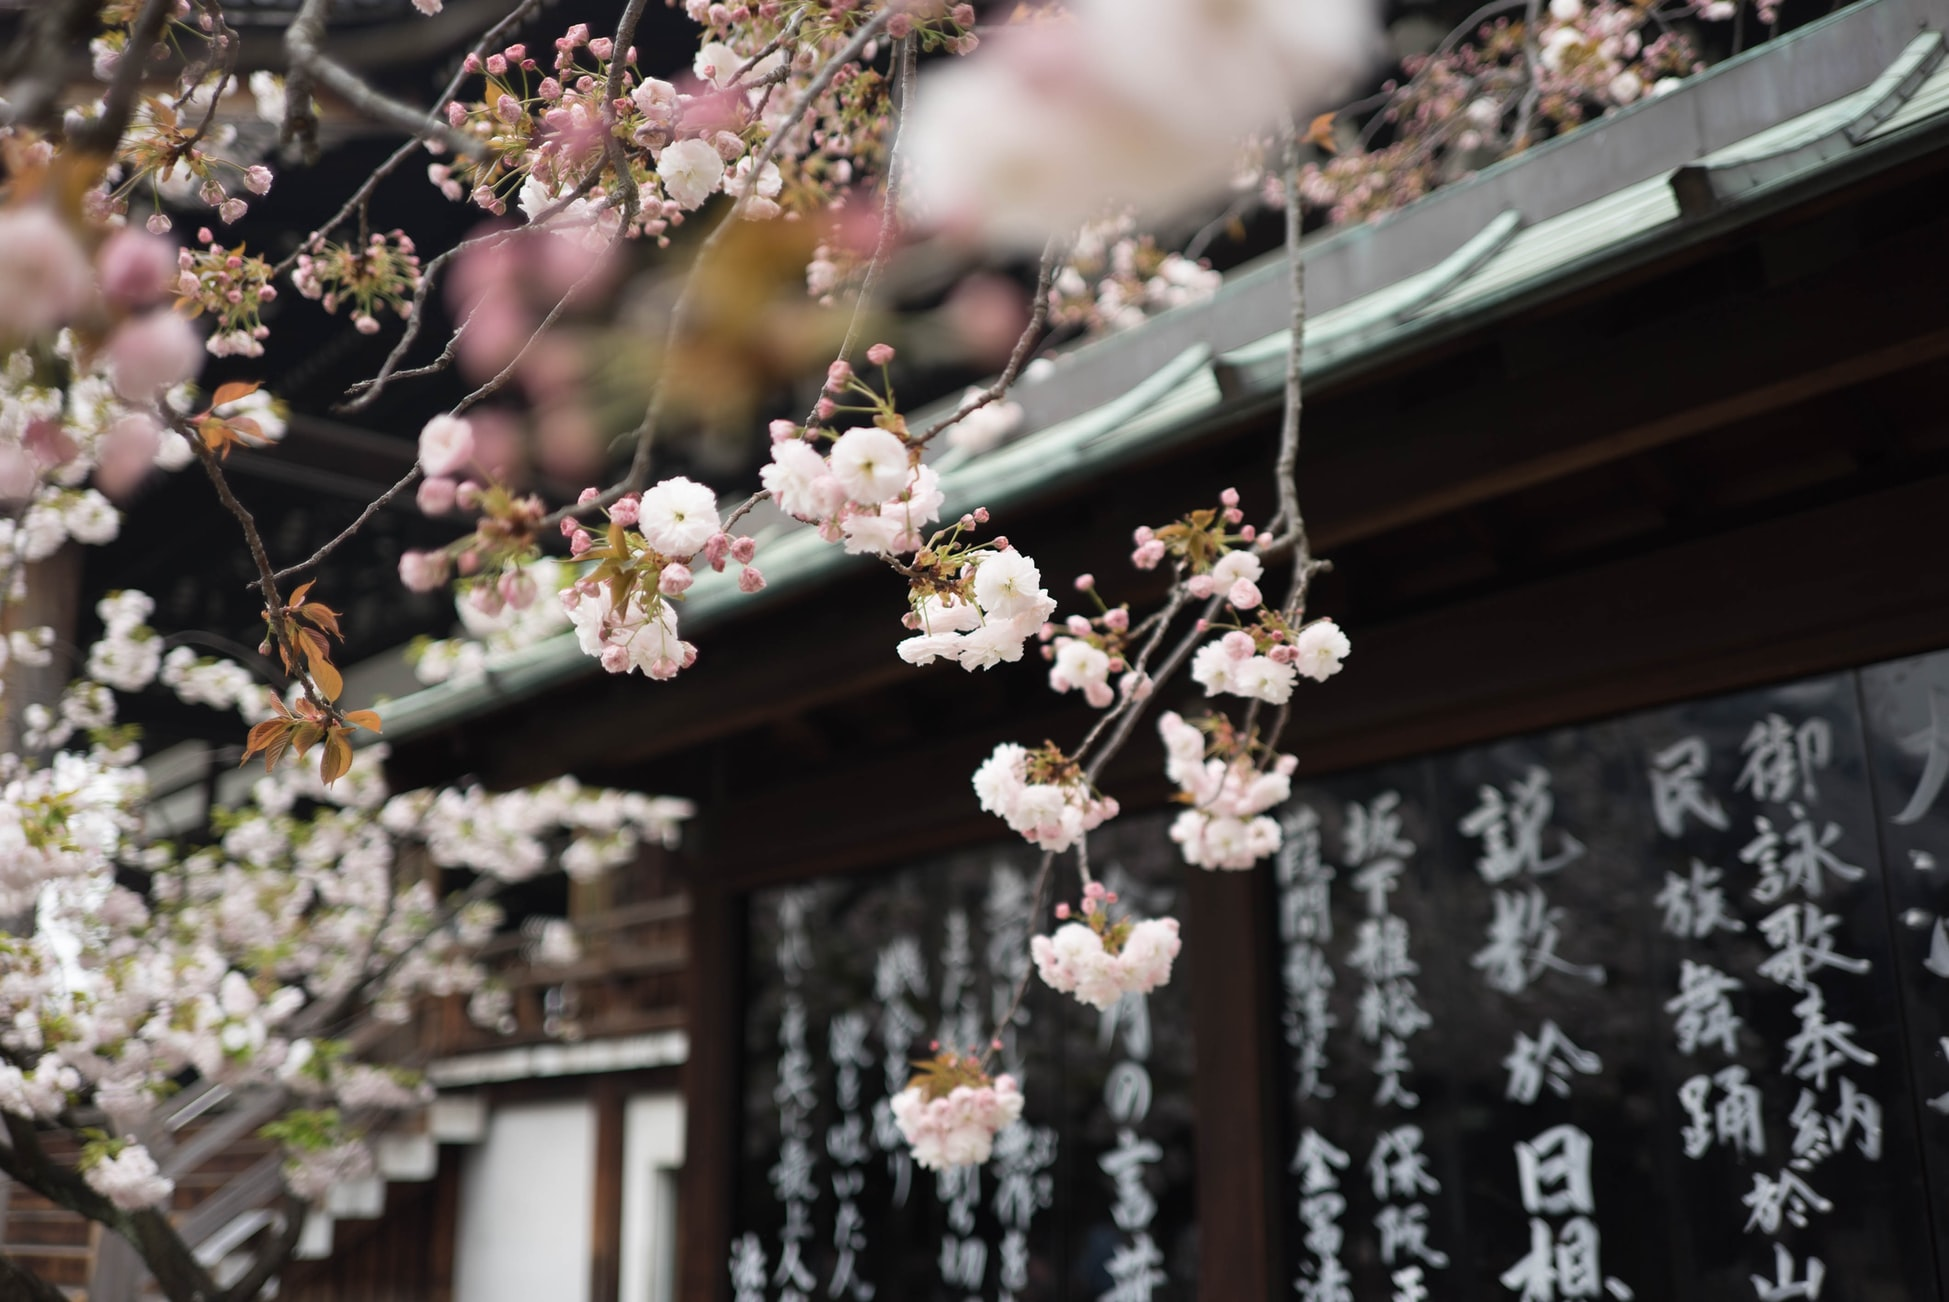 Galen Crout - Osaka, Japan Cherry blossom in Osaka